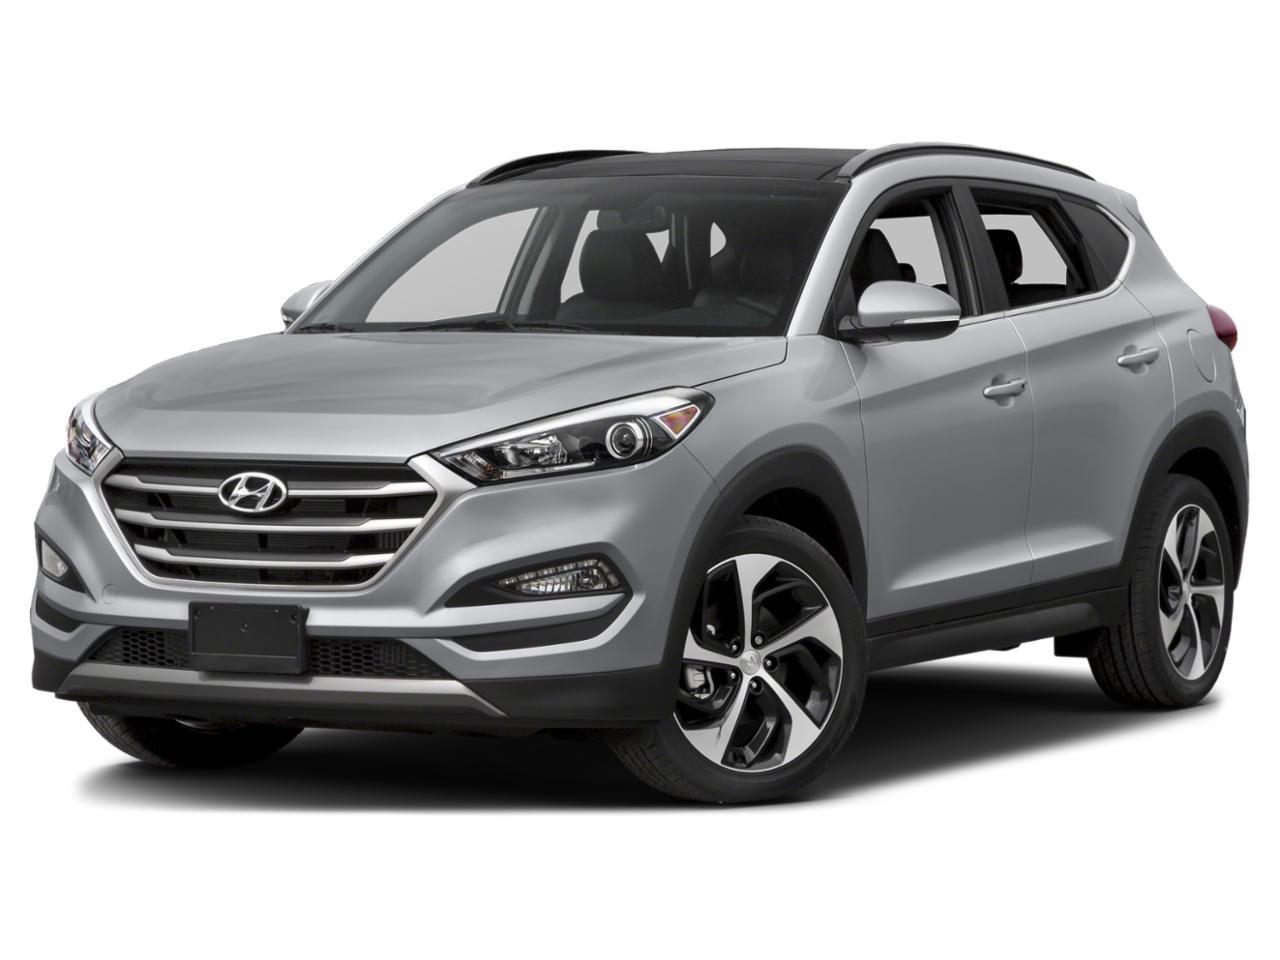 2018 Hyundai Tucson Vehicle Photo in San Antonio, TX 78238